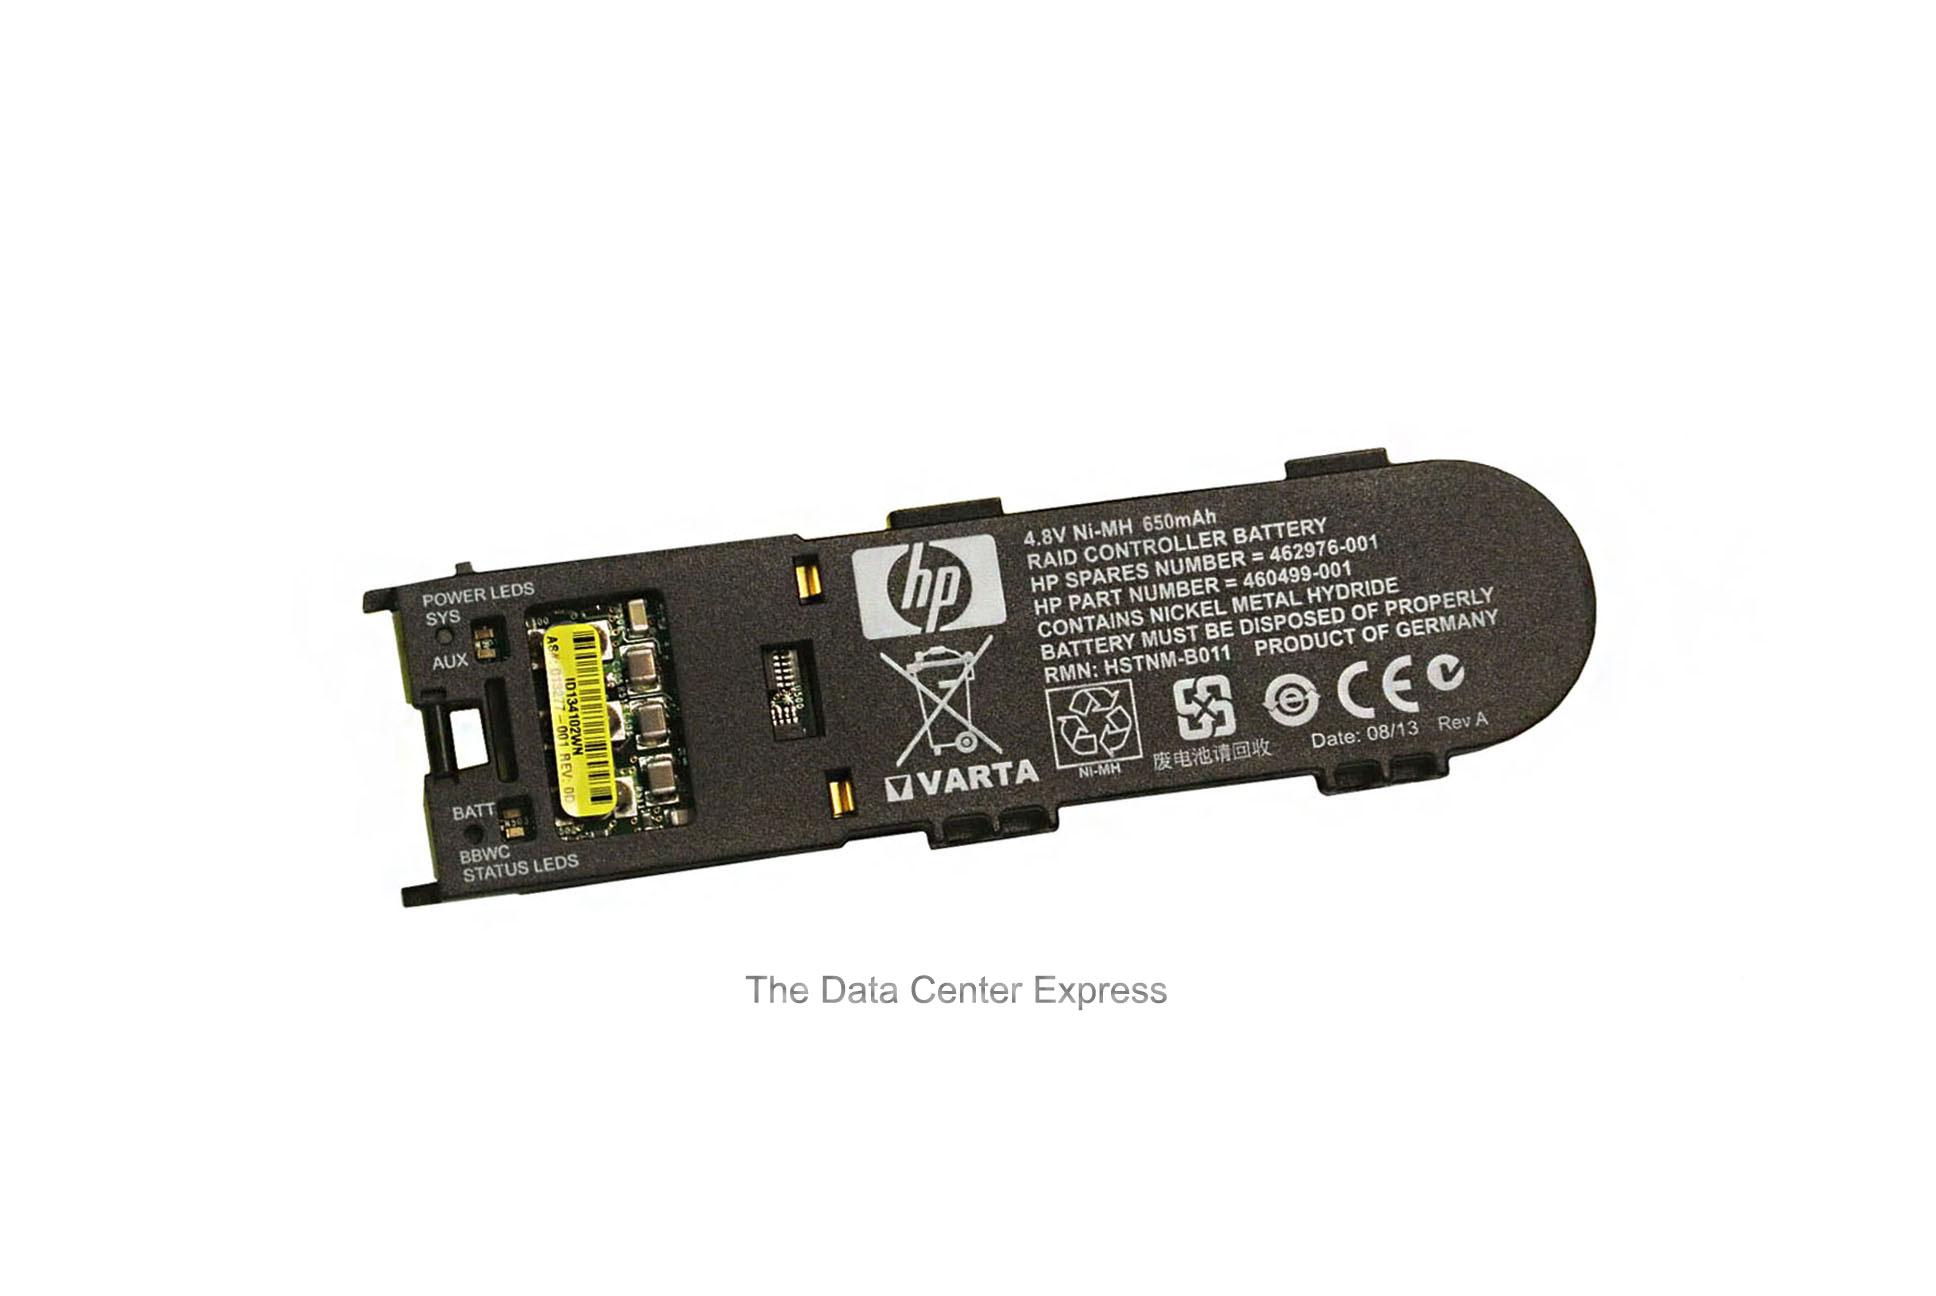 HP 650MAH Battery BBWC 2015 Date Code 462976-001 New